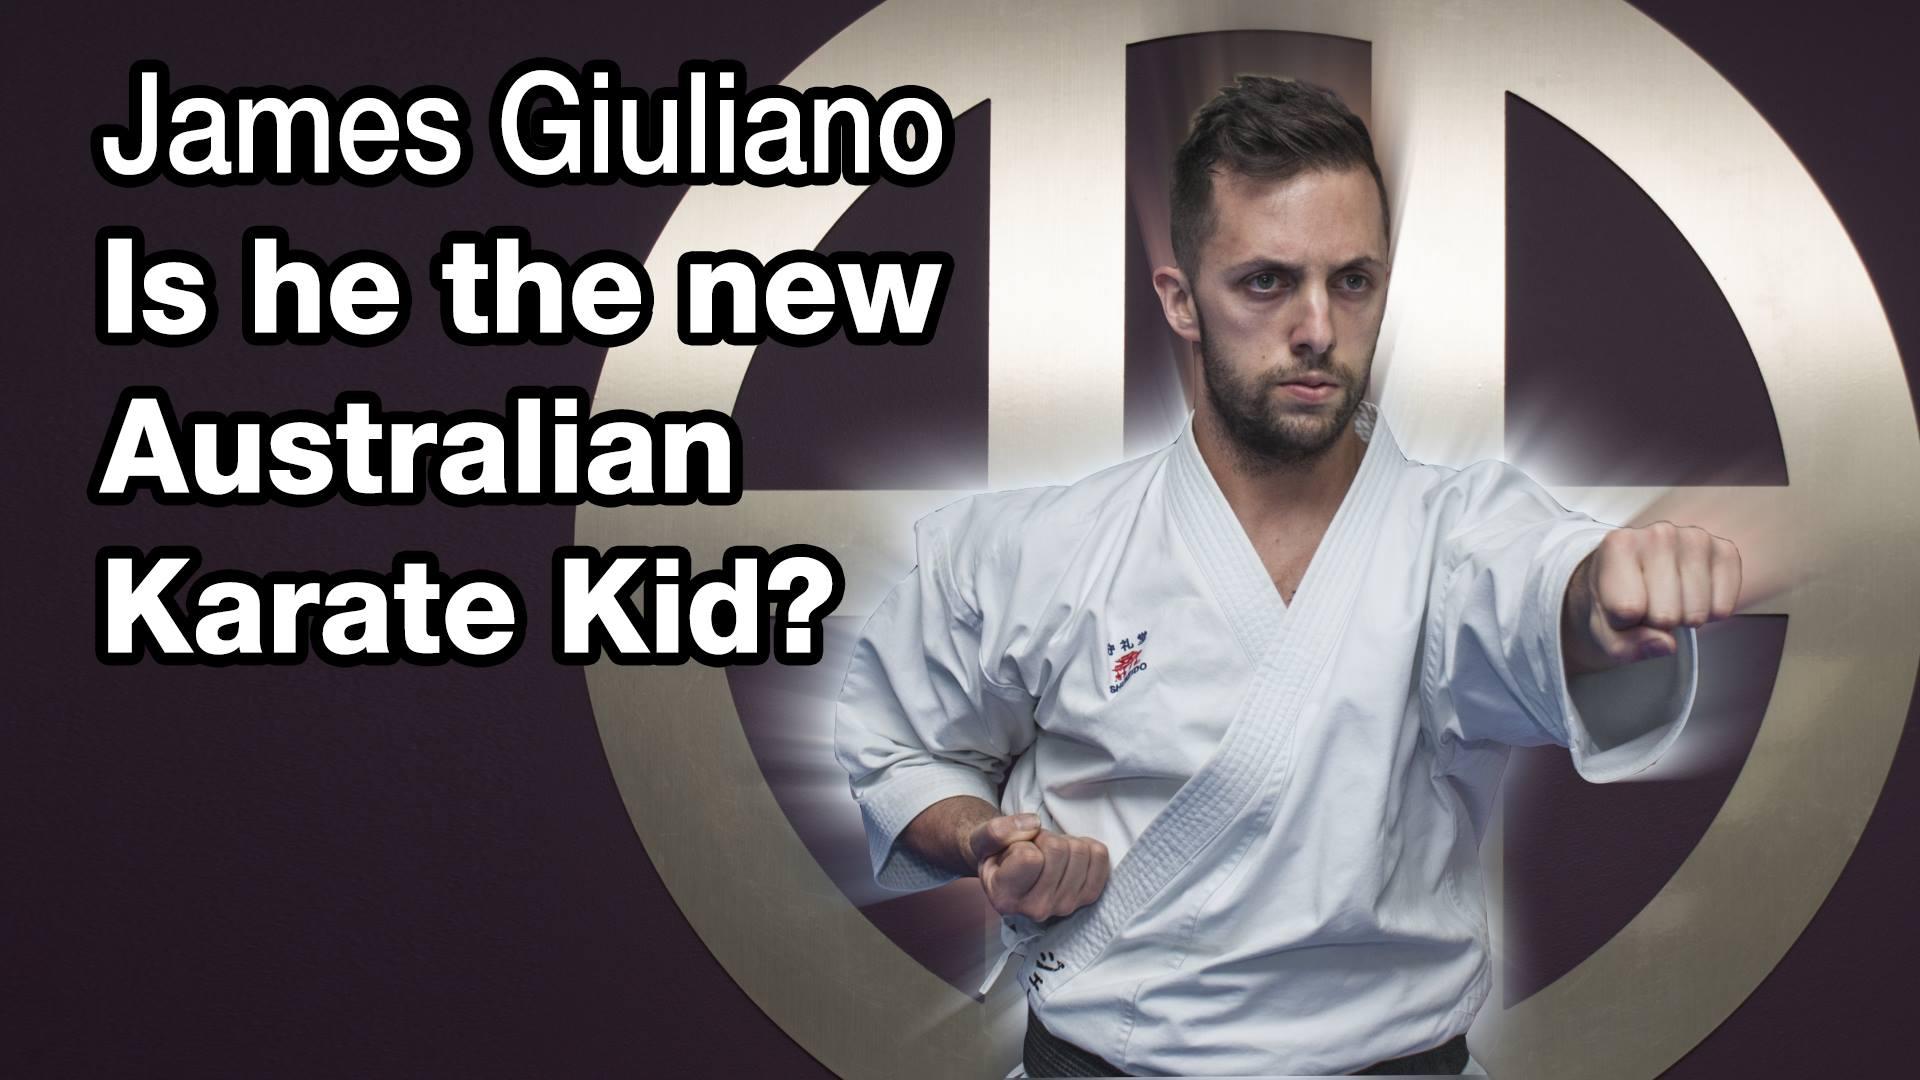 James Giuliano Training Video